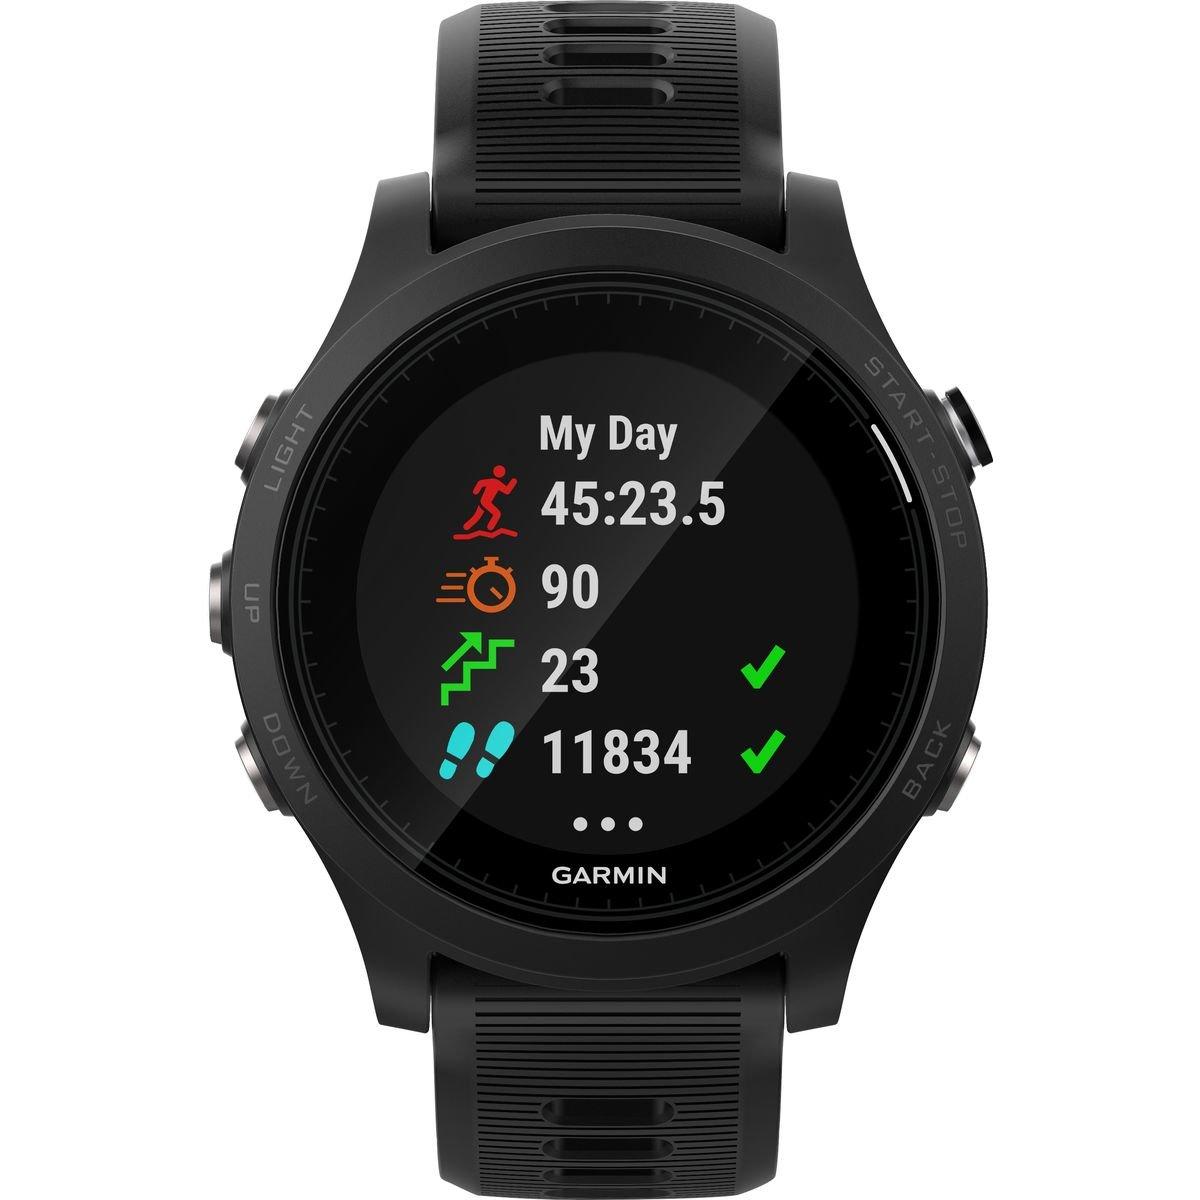 Garmin Forerunner 935 GPS Watch Black/Black Band, One Size